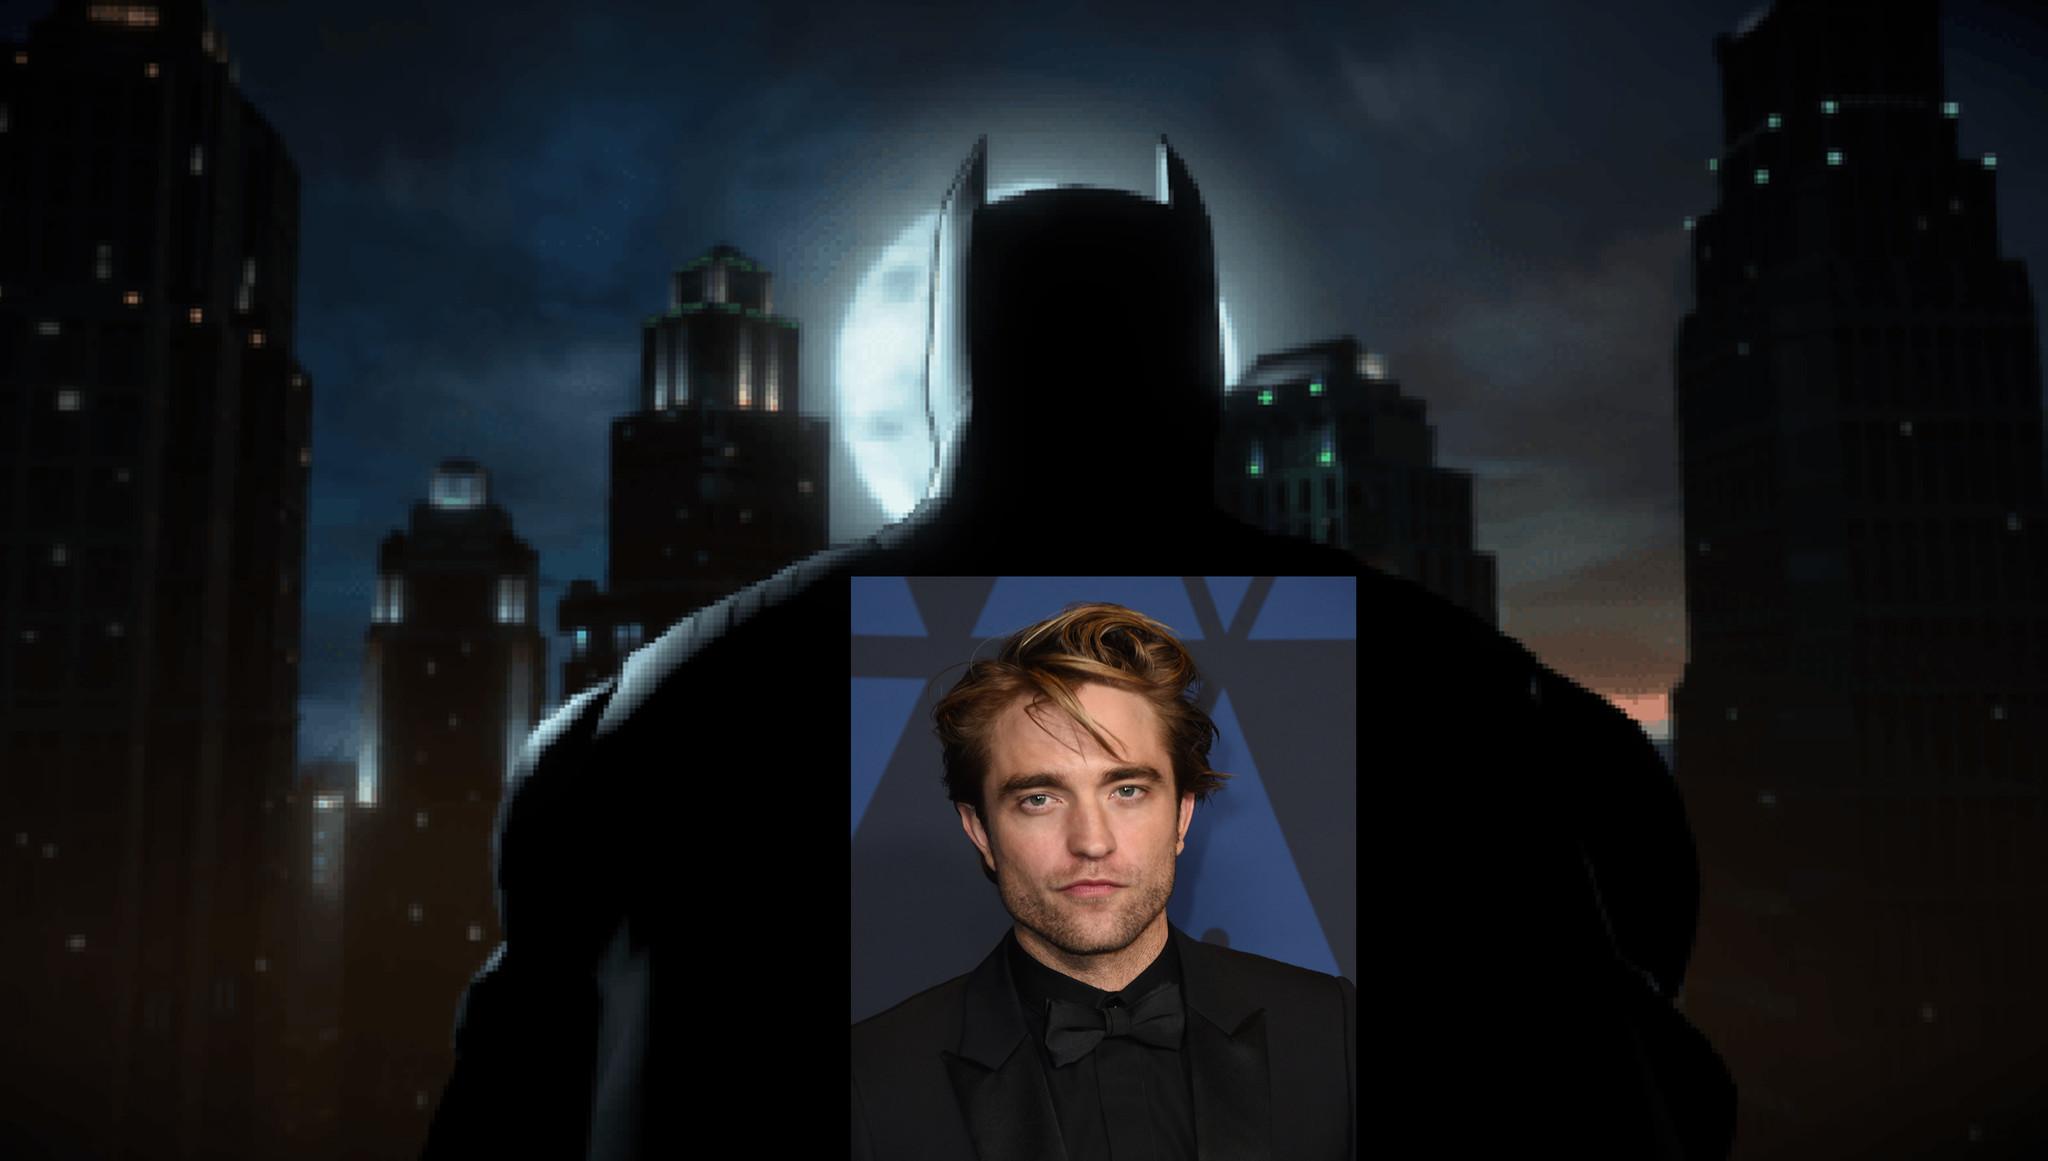 'The Batman' production paused by Warner Bros. amid coronavirus concerns